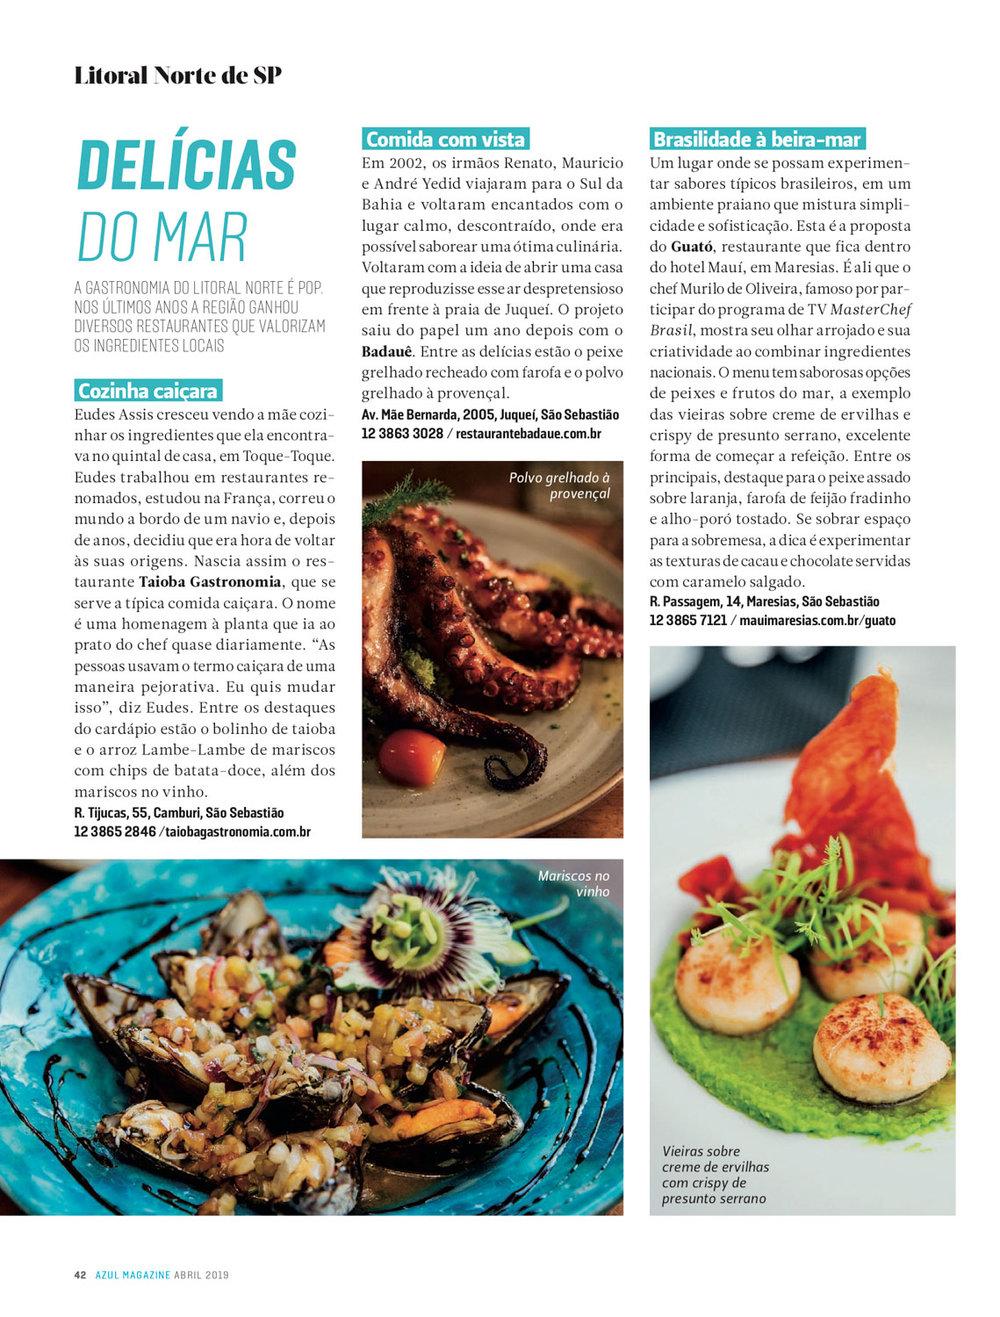 Azul Magazine - Litoral SP_AngeloDalBo_04.jpg